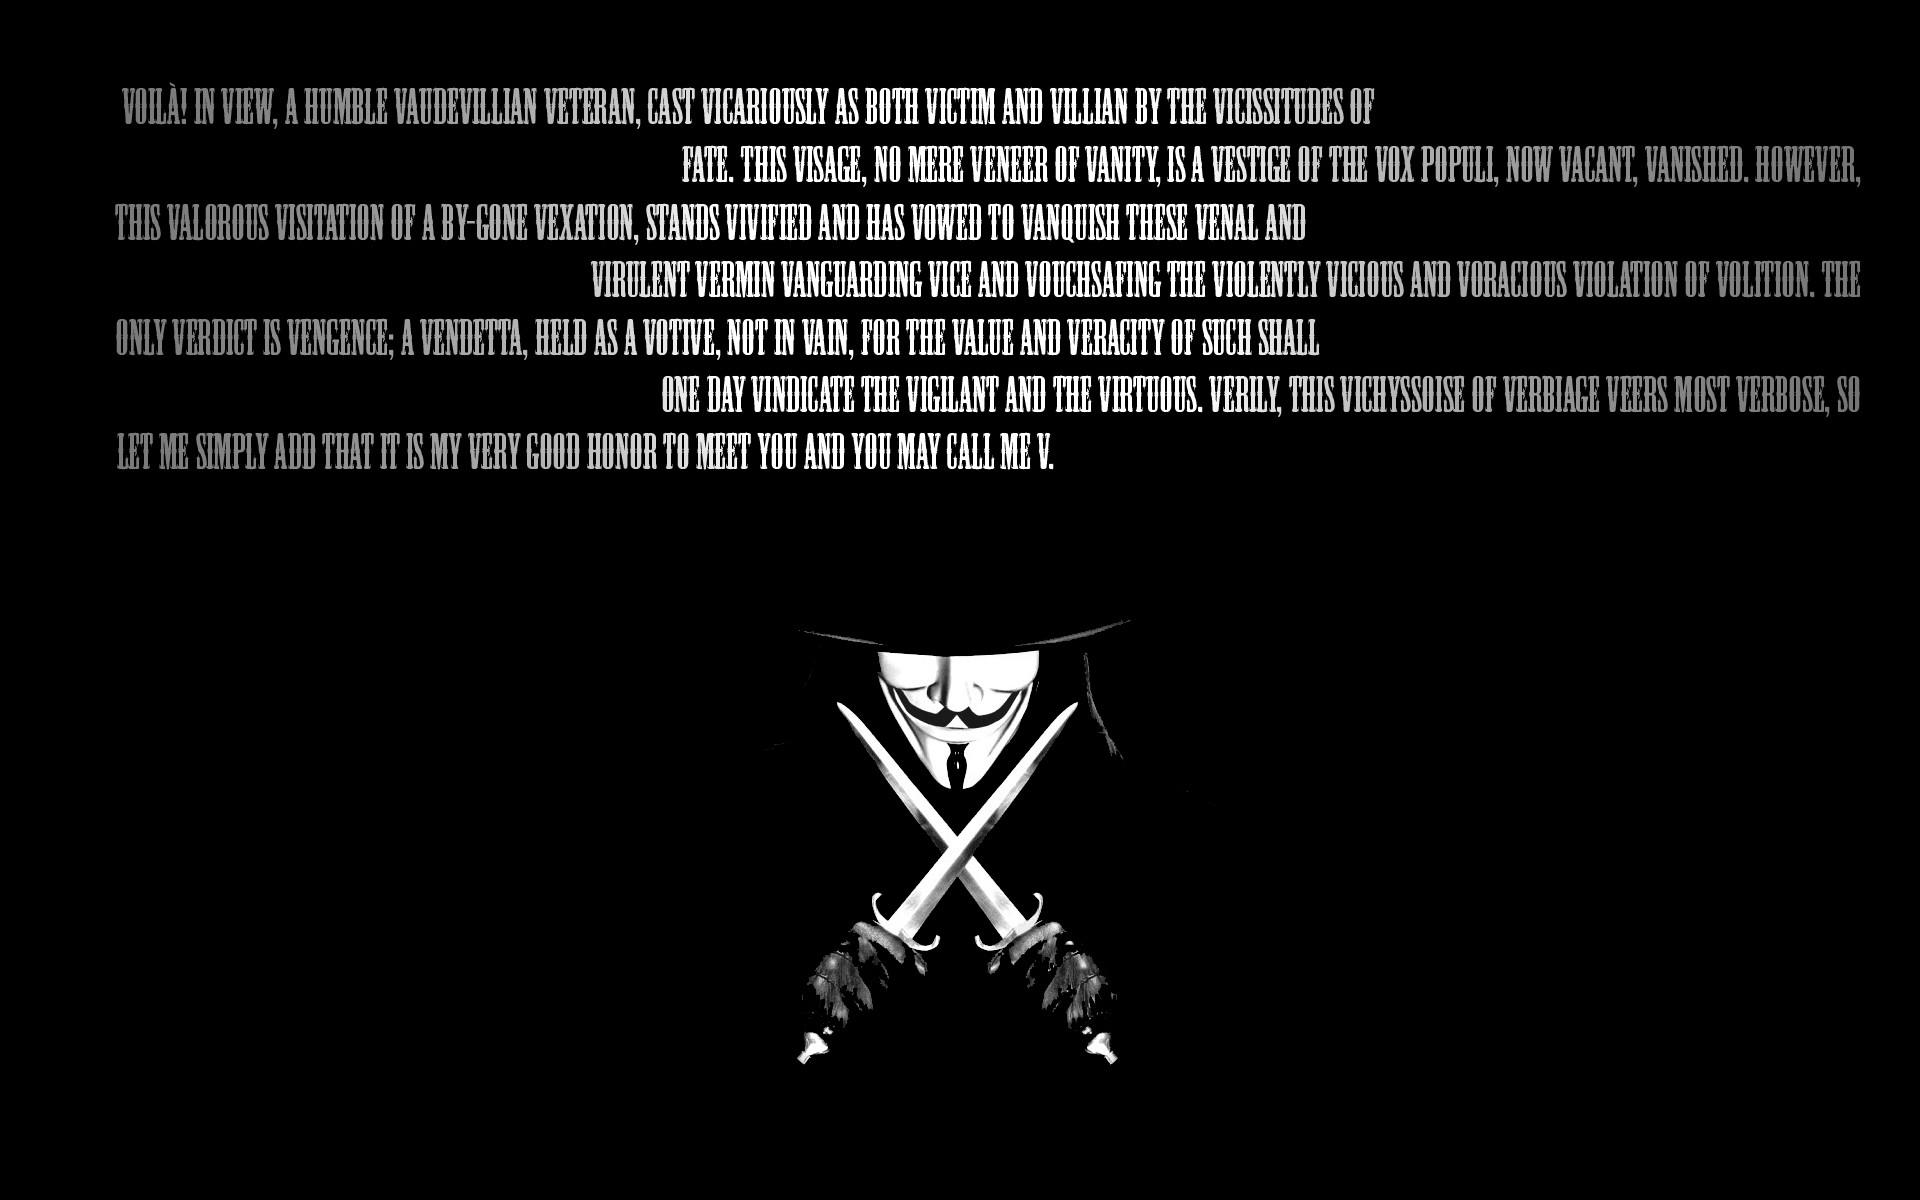 V For Vendetta Wallpaper HD 1